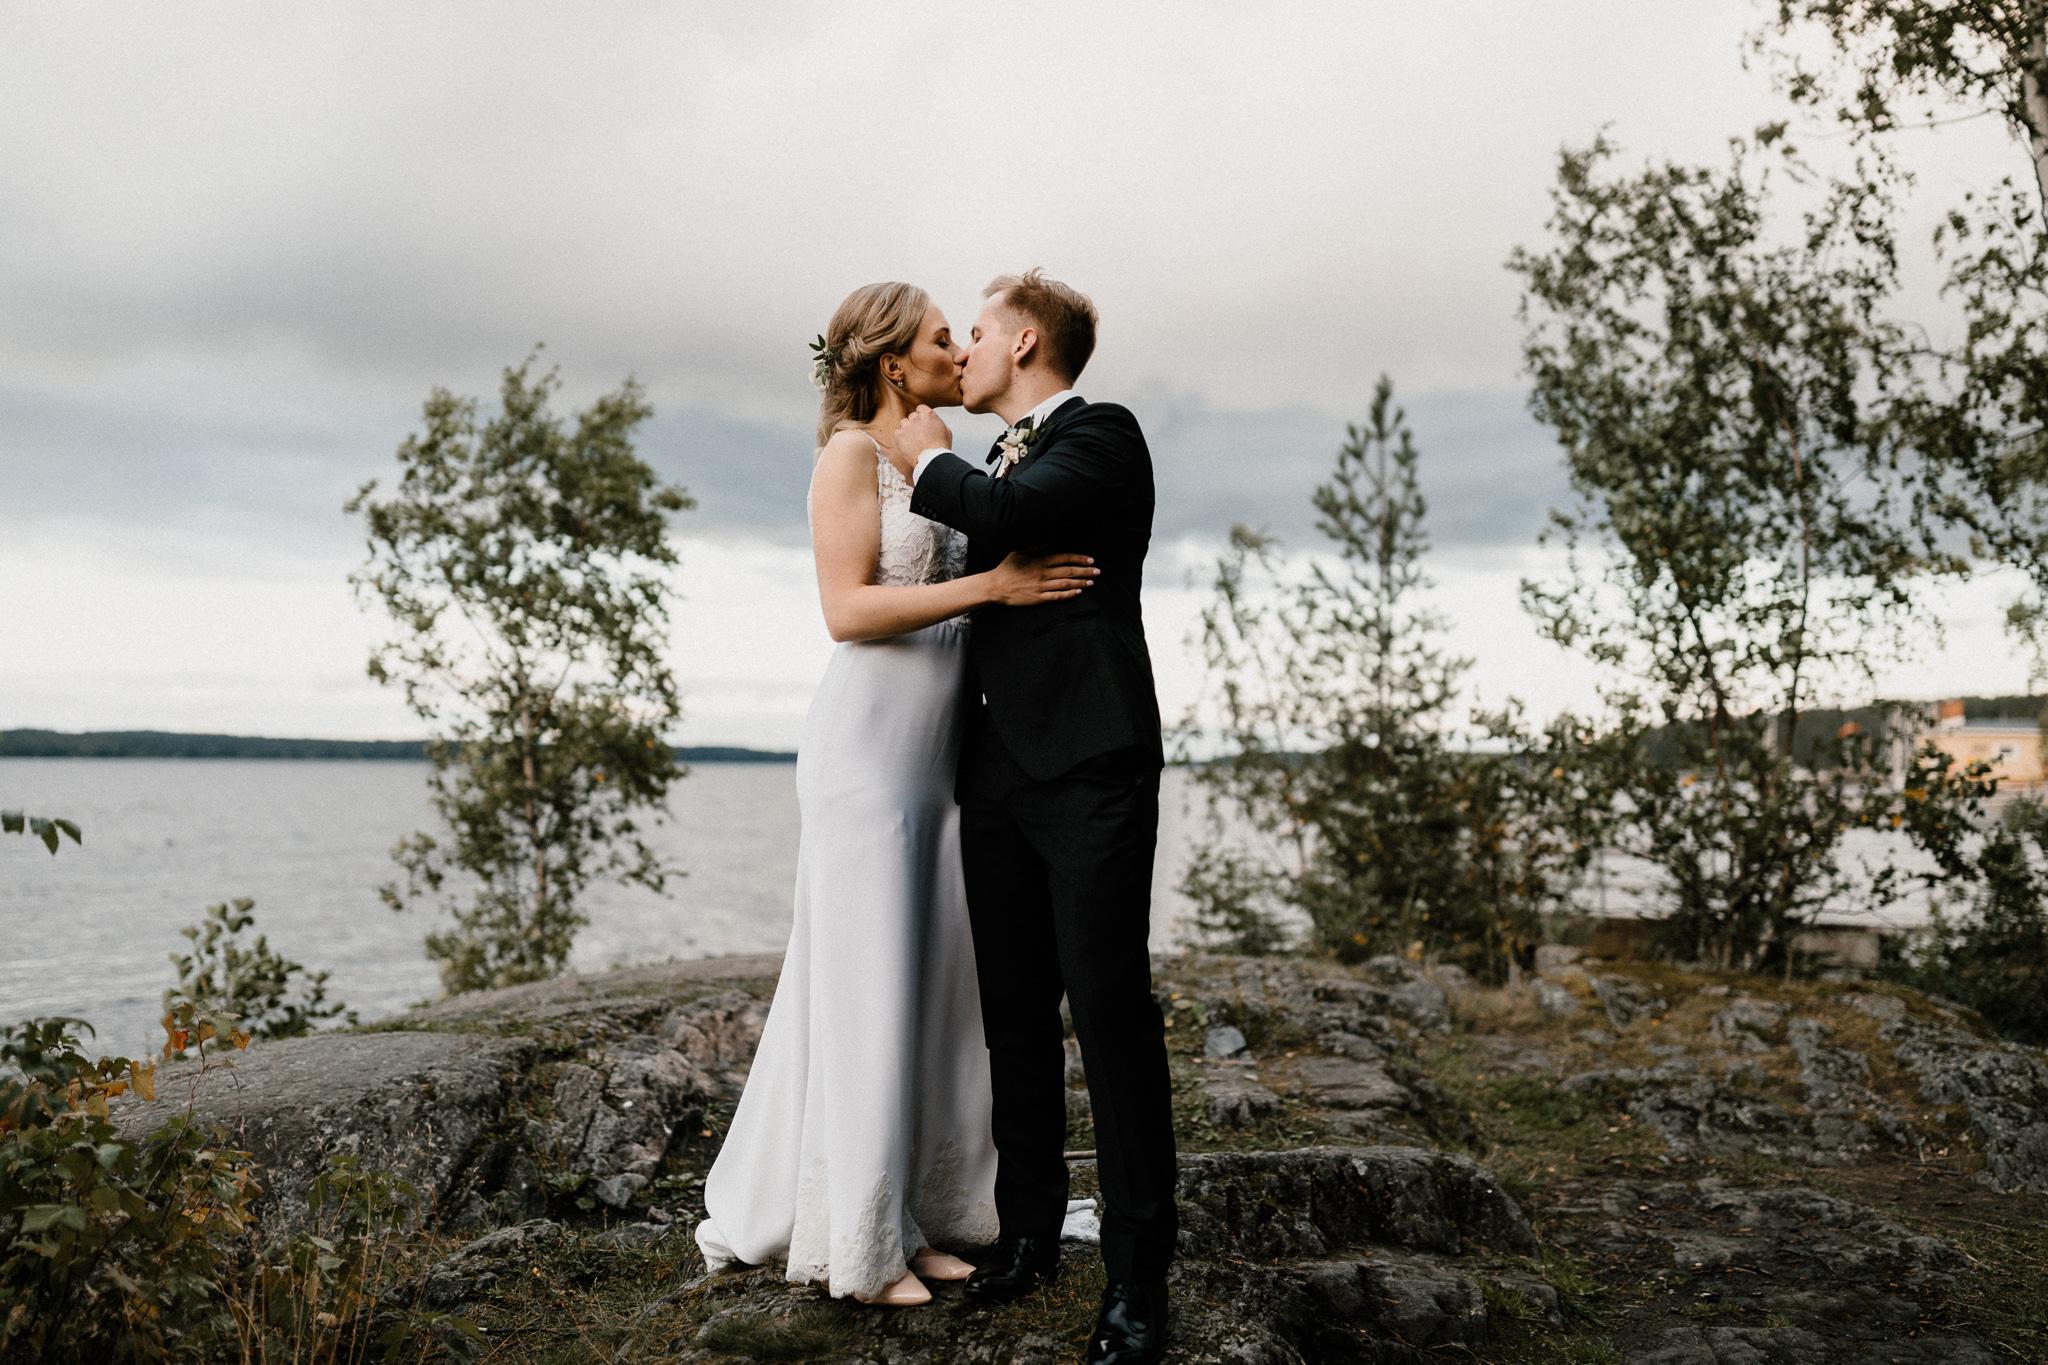 Johanna + Mikko - Tampere - Photo by Patrick Karkkolainen Wedding Photographer-140.jpg